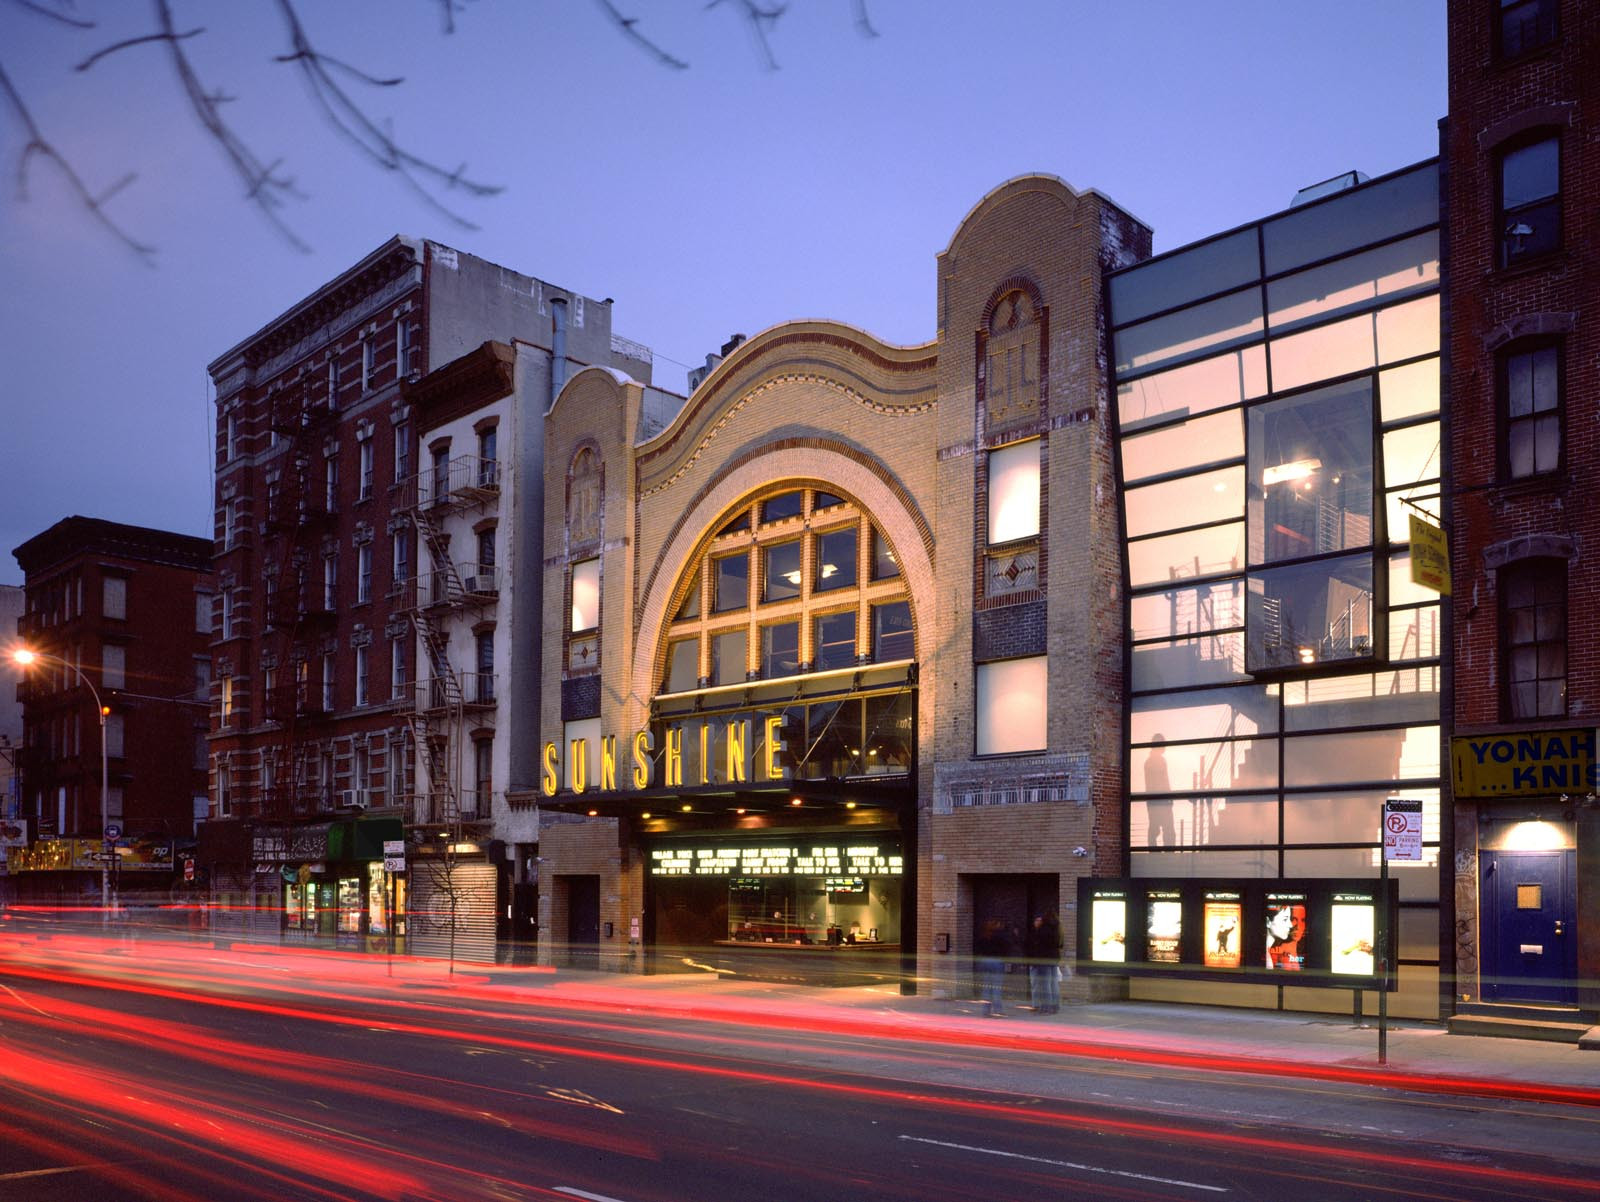 Sunshine Theatre, New York